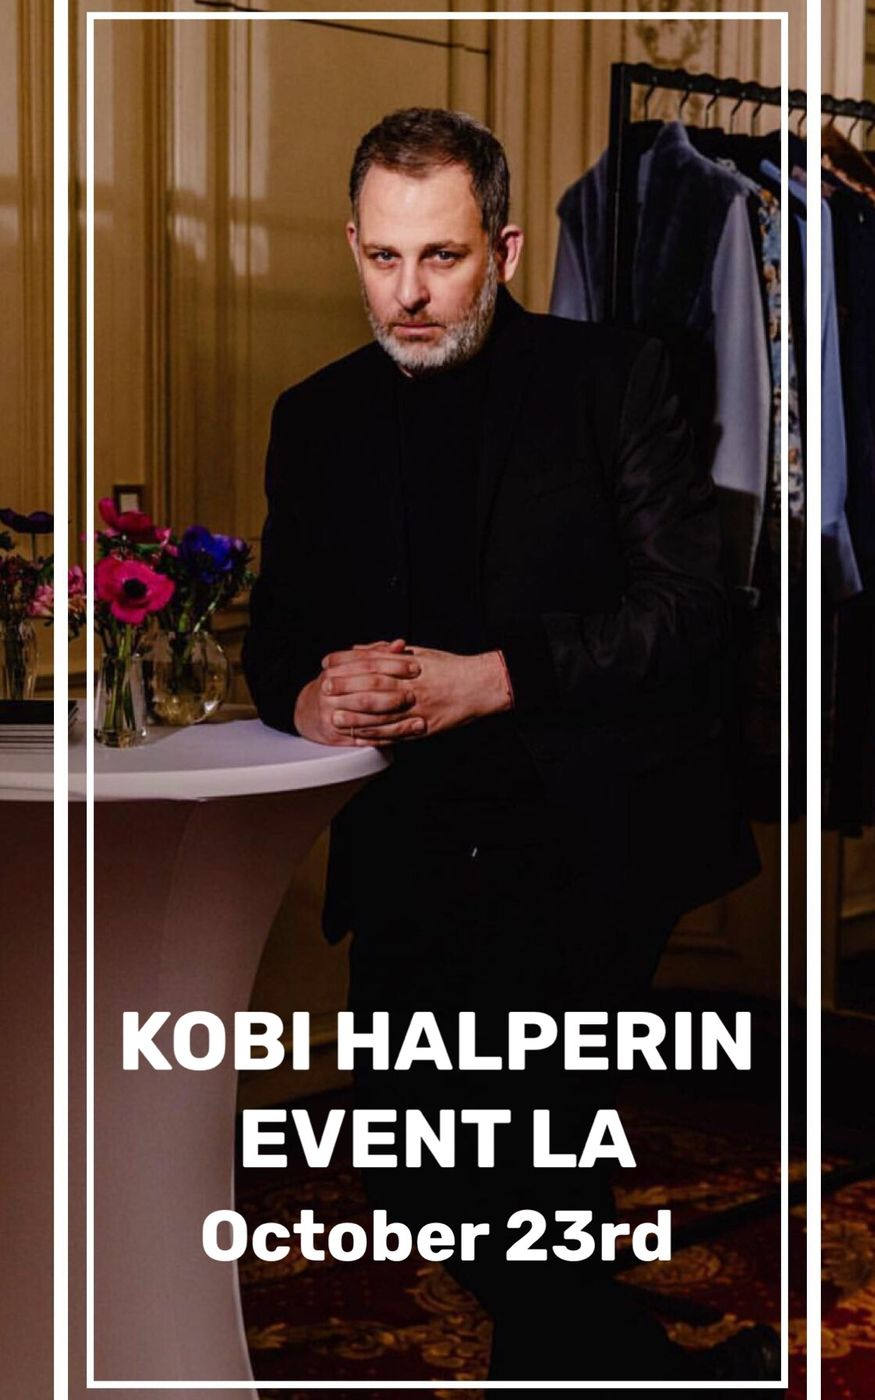 Kobi Halperin event Moodboard